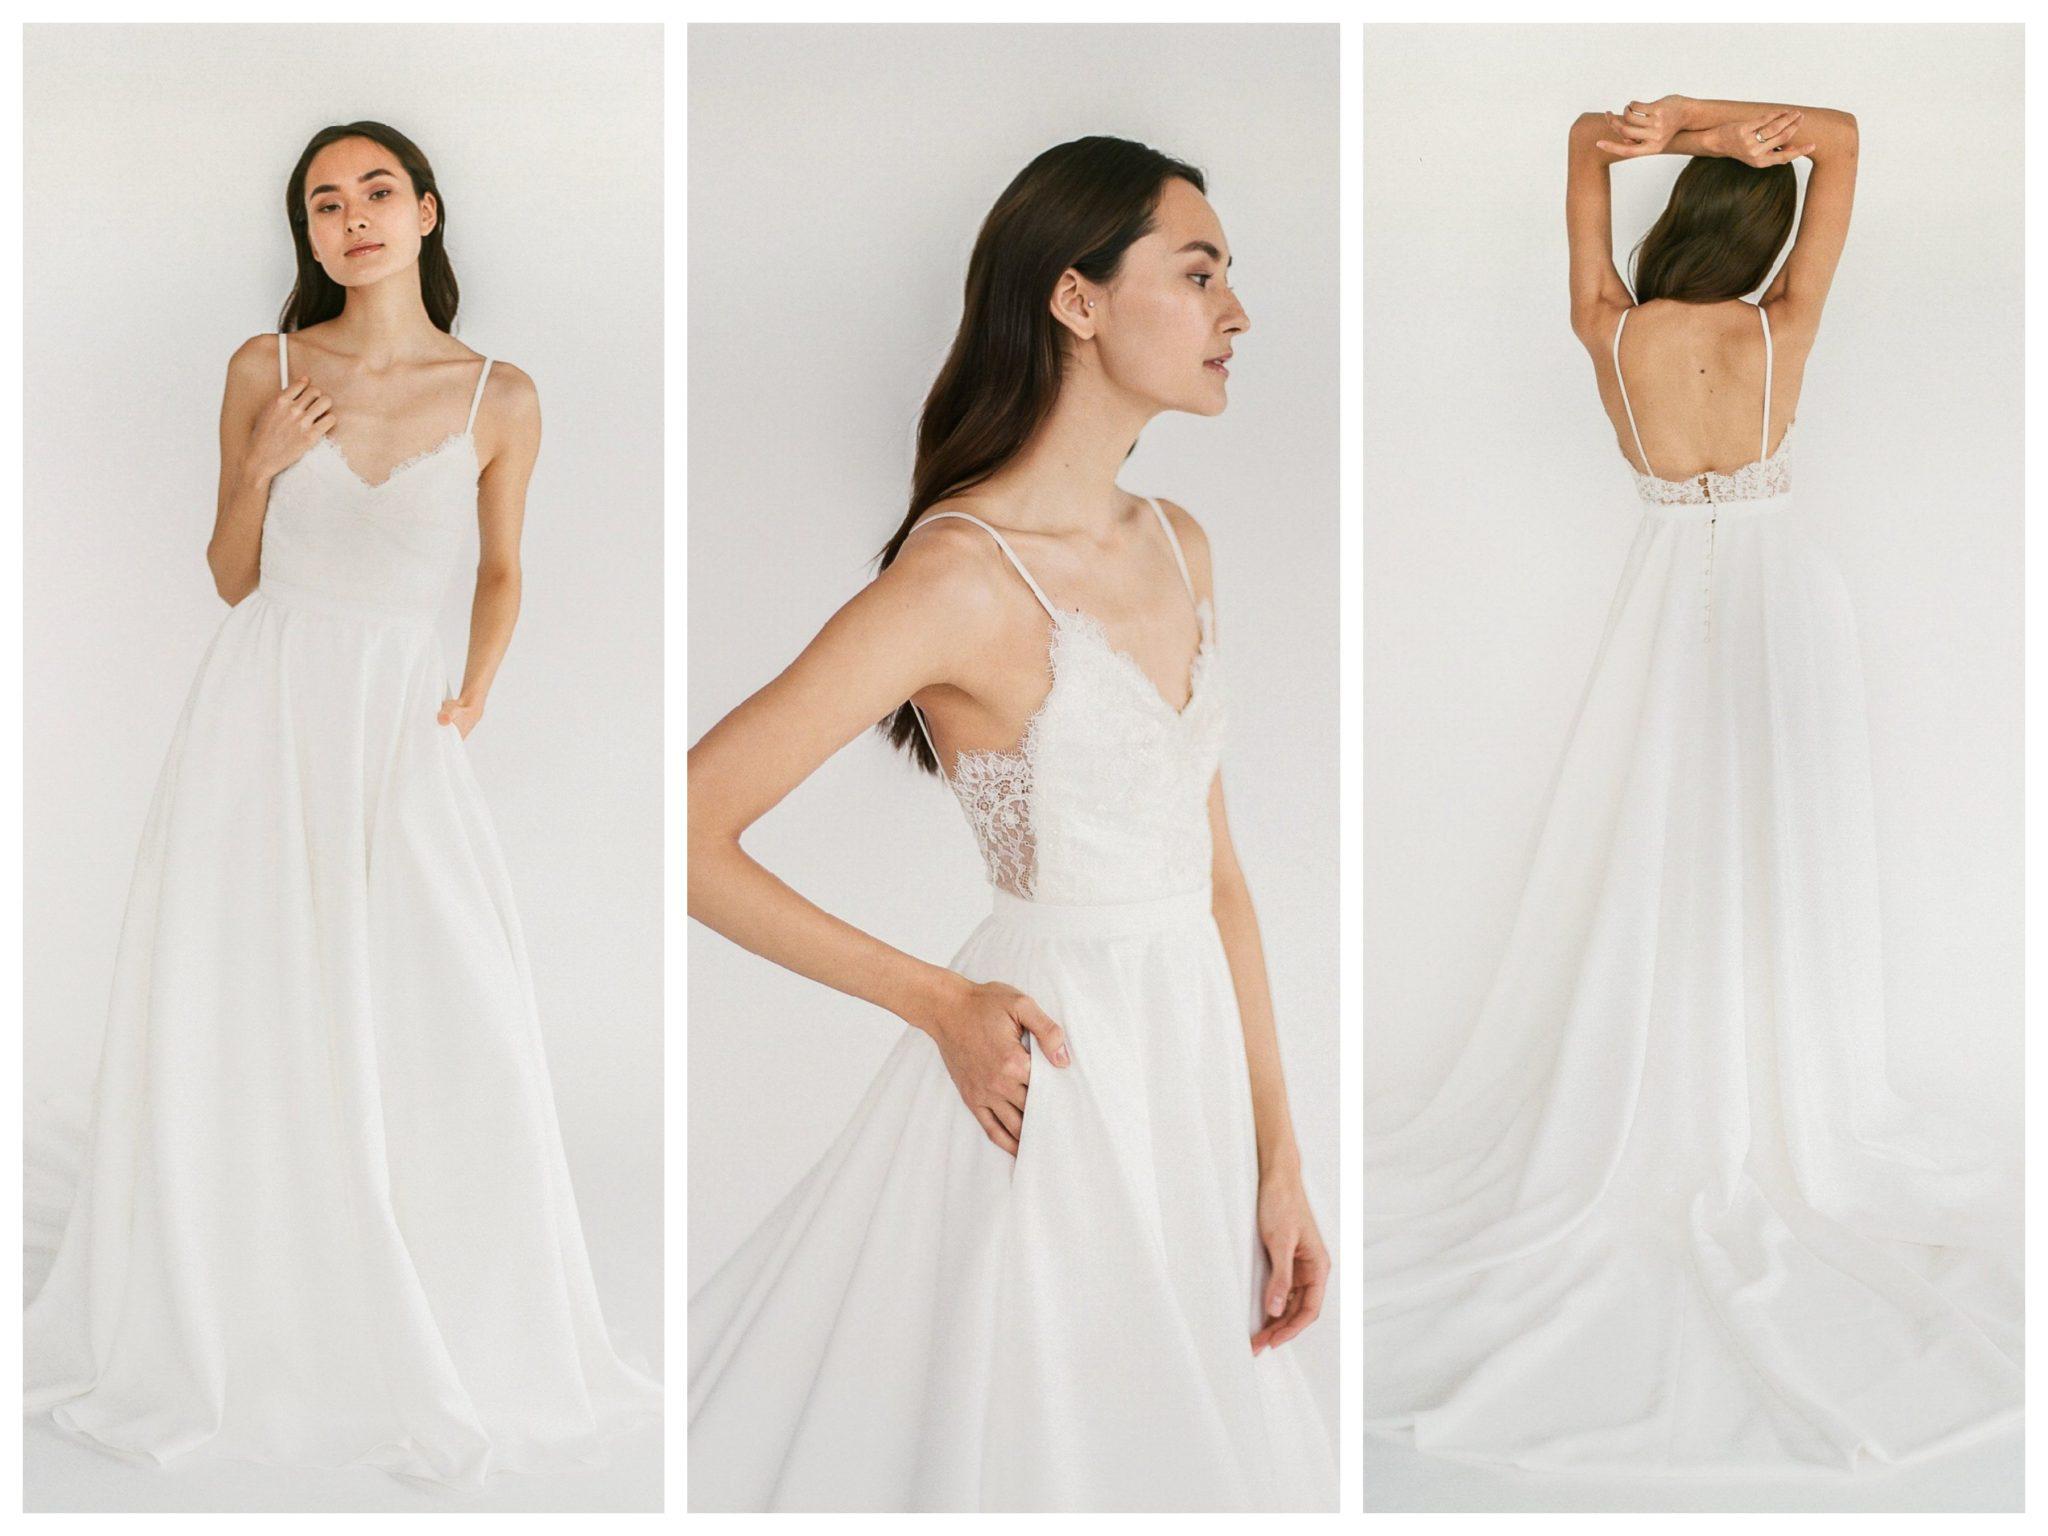 Wedding dresses for broad shoulders by top Los Angeles bridal shop, Love and Lace Bridal Salon: Truvelle Bridal's Trisha